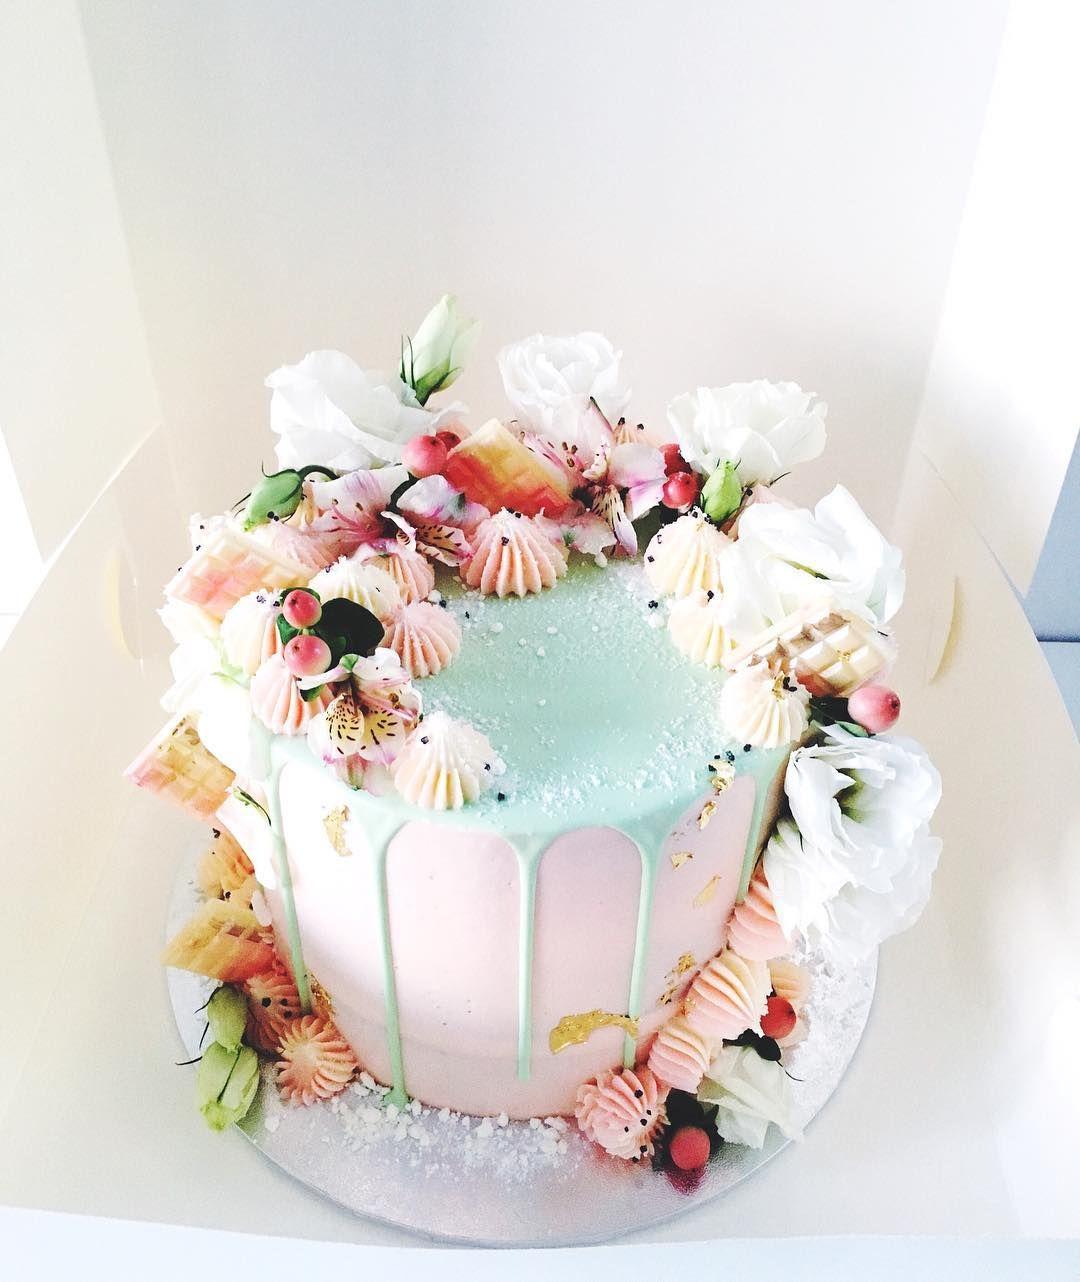 Unique Pastel Cake By Perth Baker Marguerite Cakes Margueritecakes